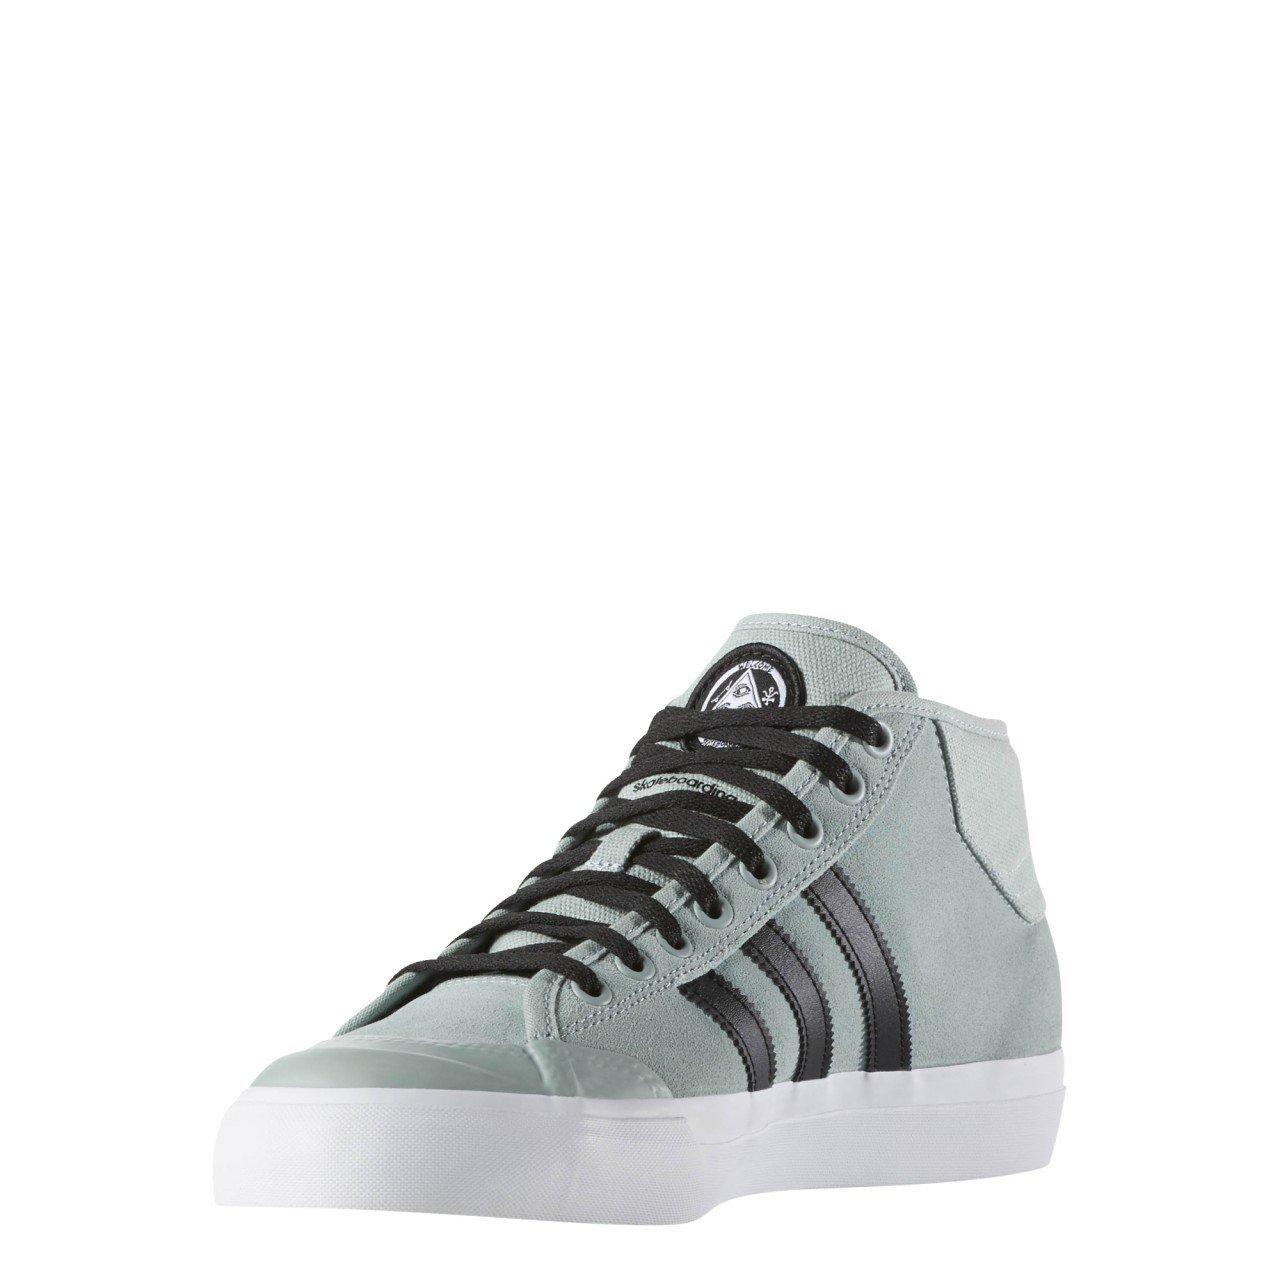 adidas Skateboarding x Welcome Jersey | White | Jerseys